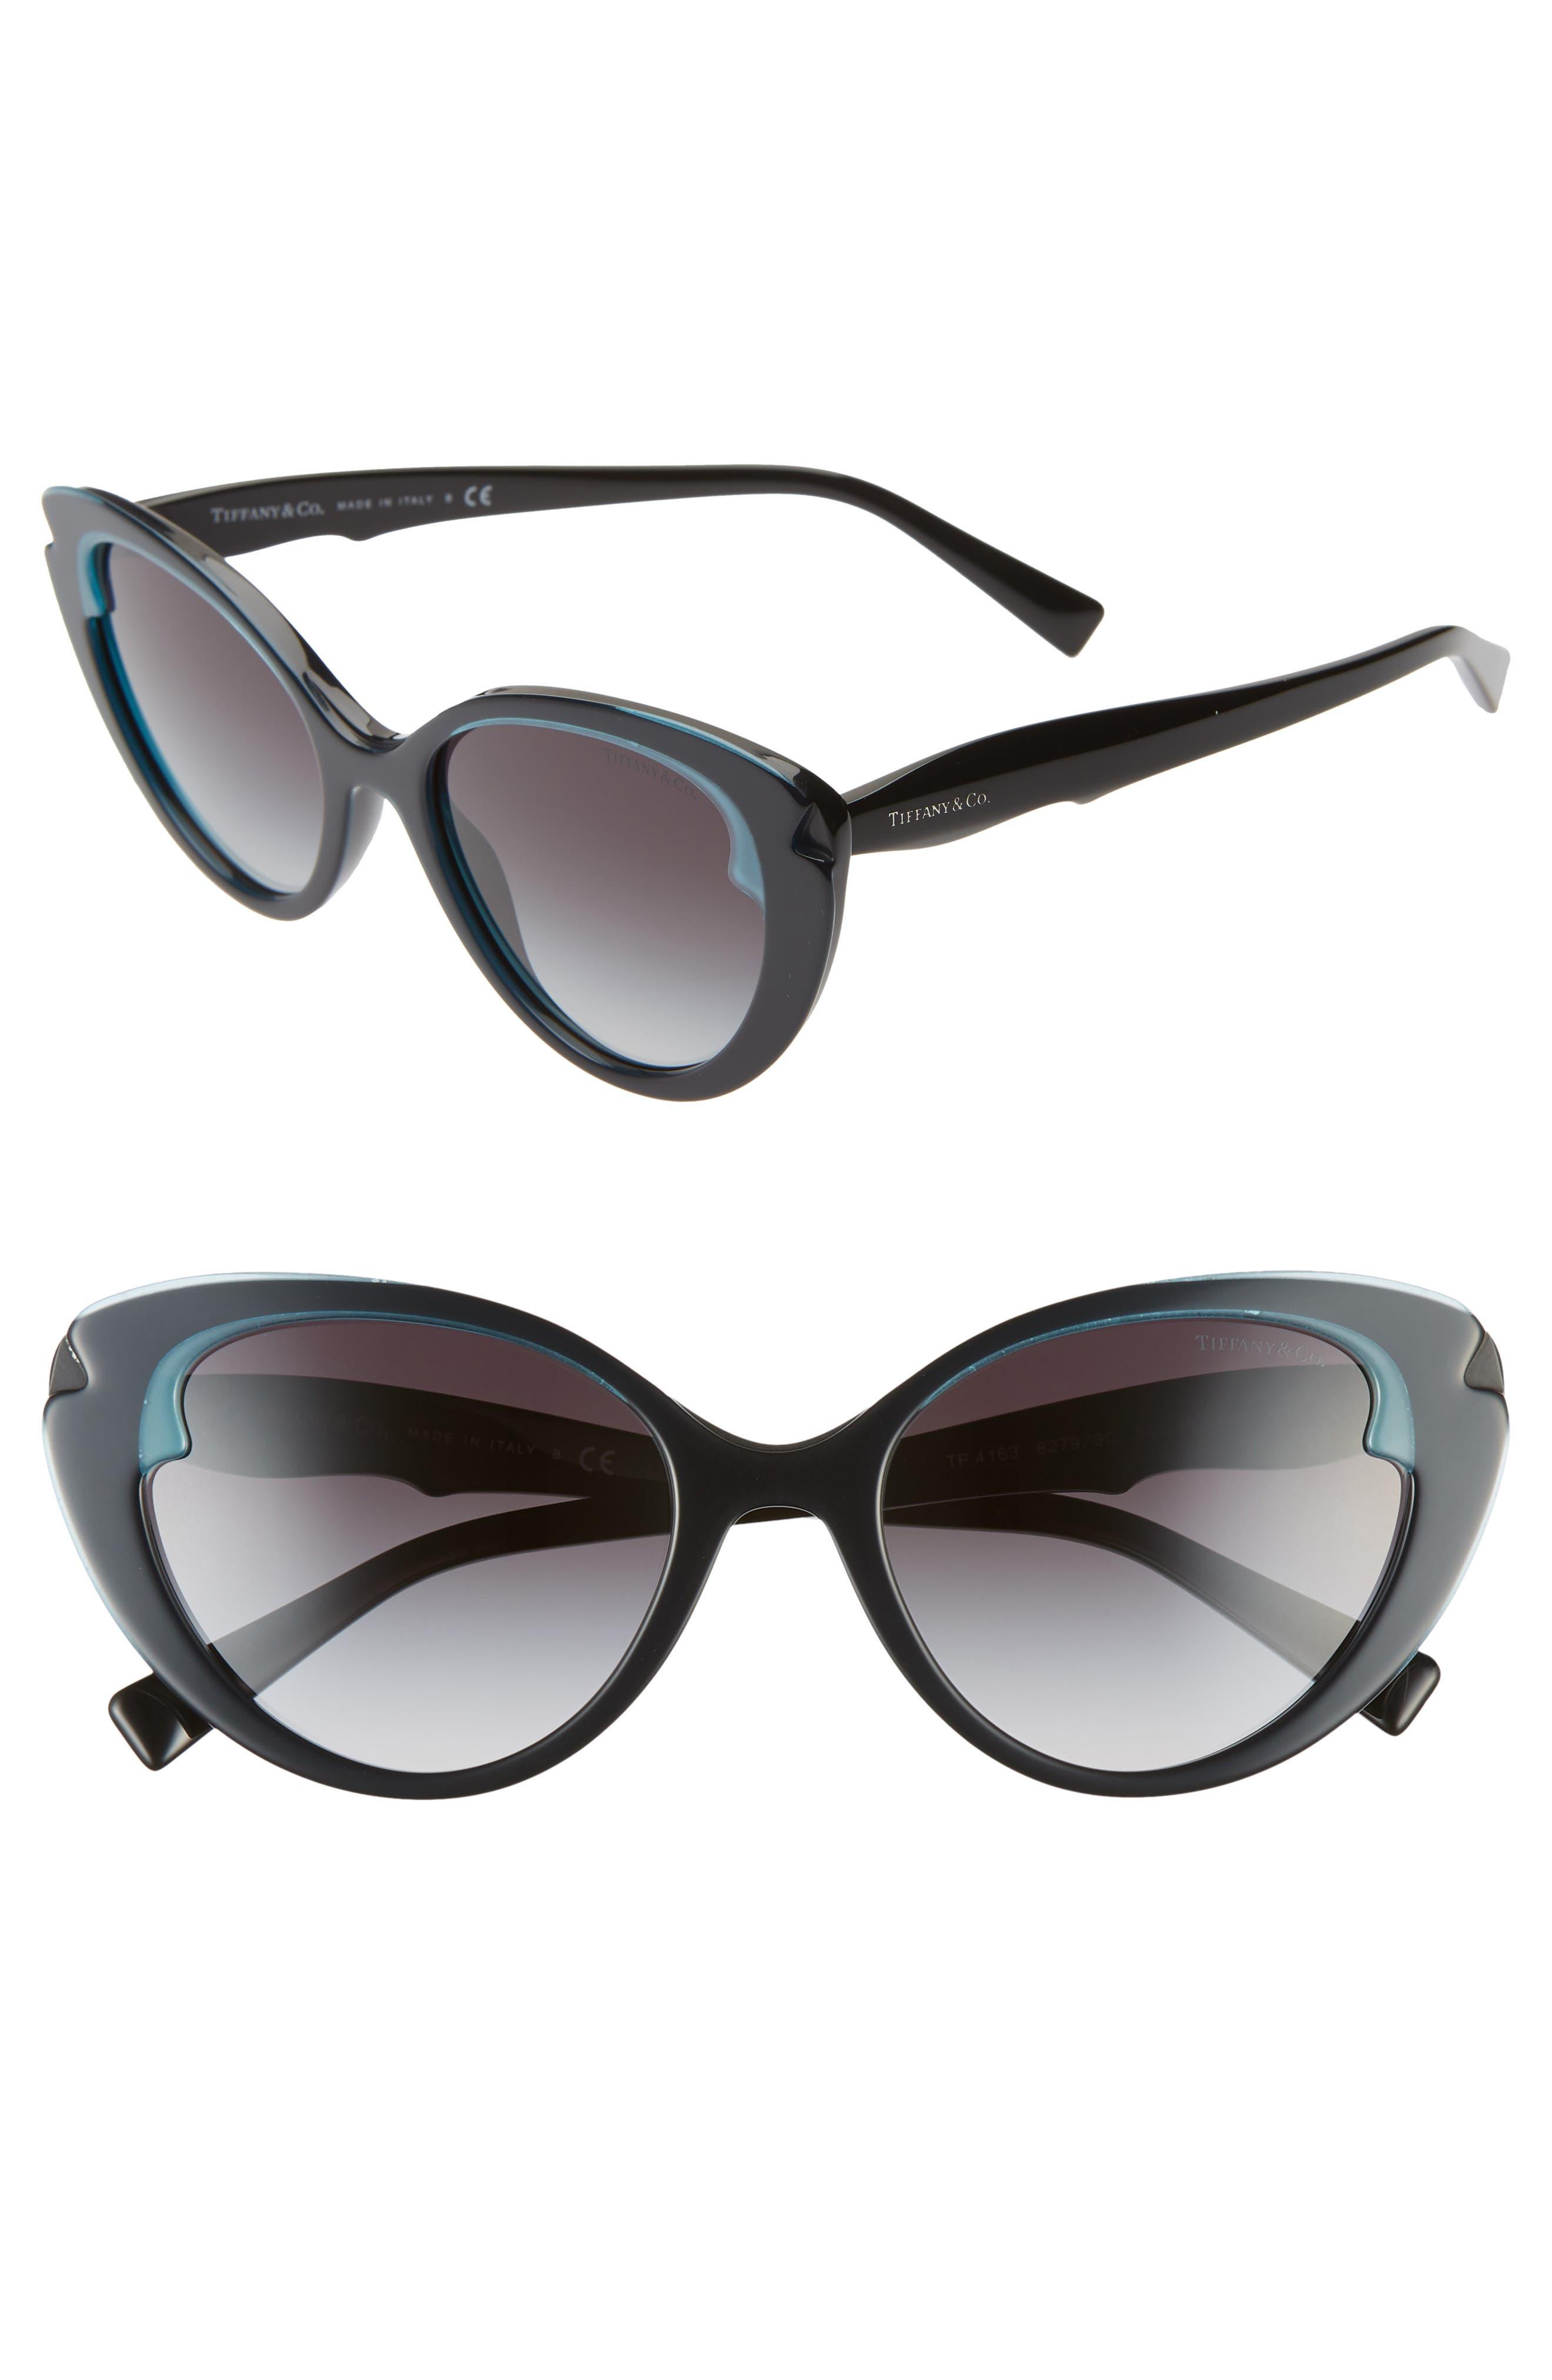 8ef1c3e9610 Tiffany & Co. Sunglasses for Women   Nordstrom